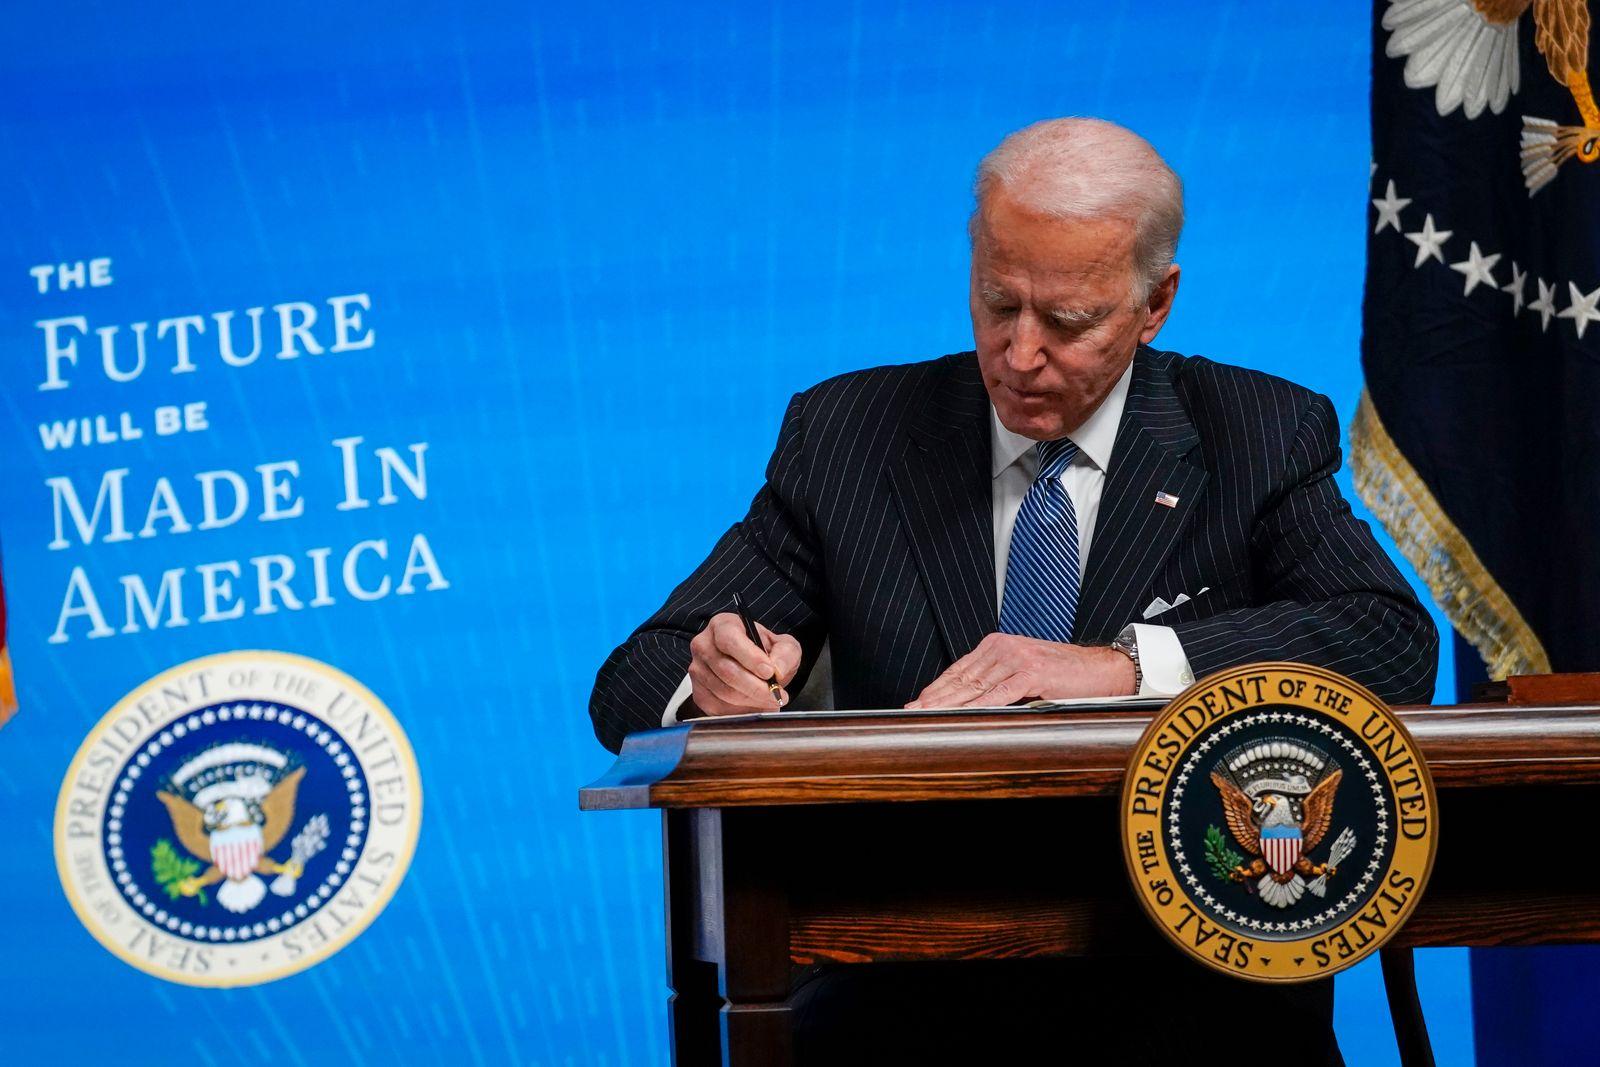 President Biden Signs Executive Order After Delivering Remarks On American Manufacturing